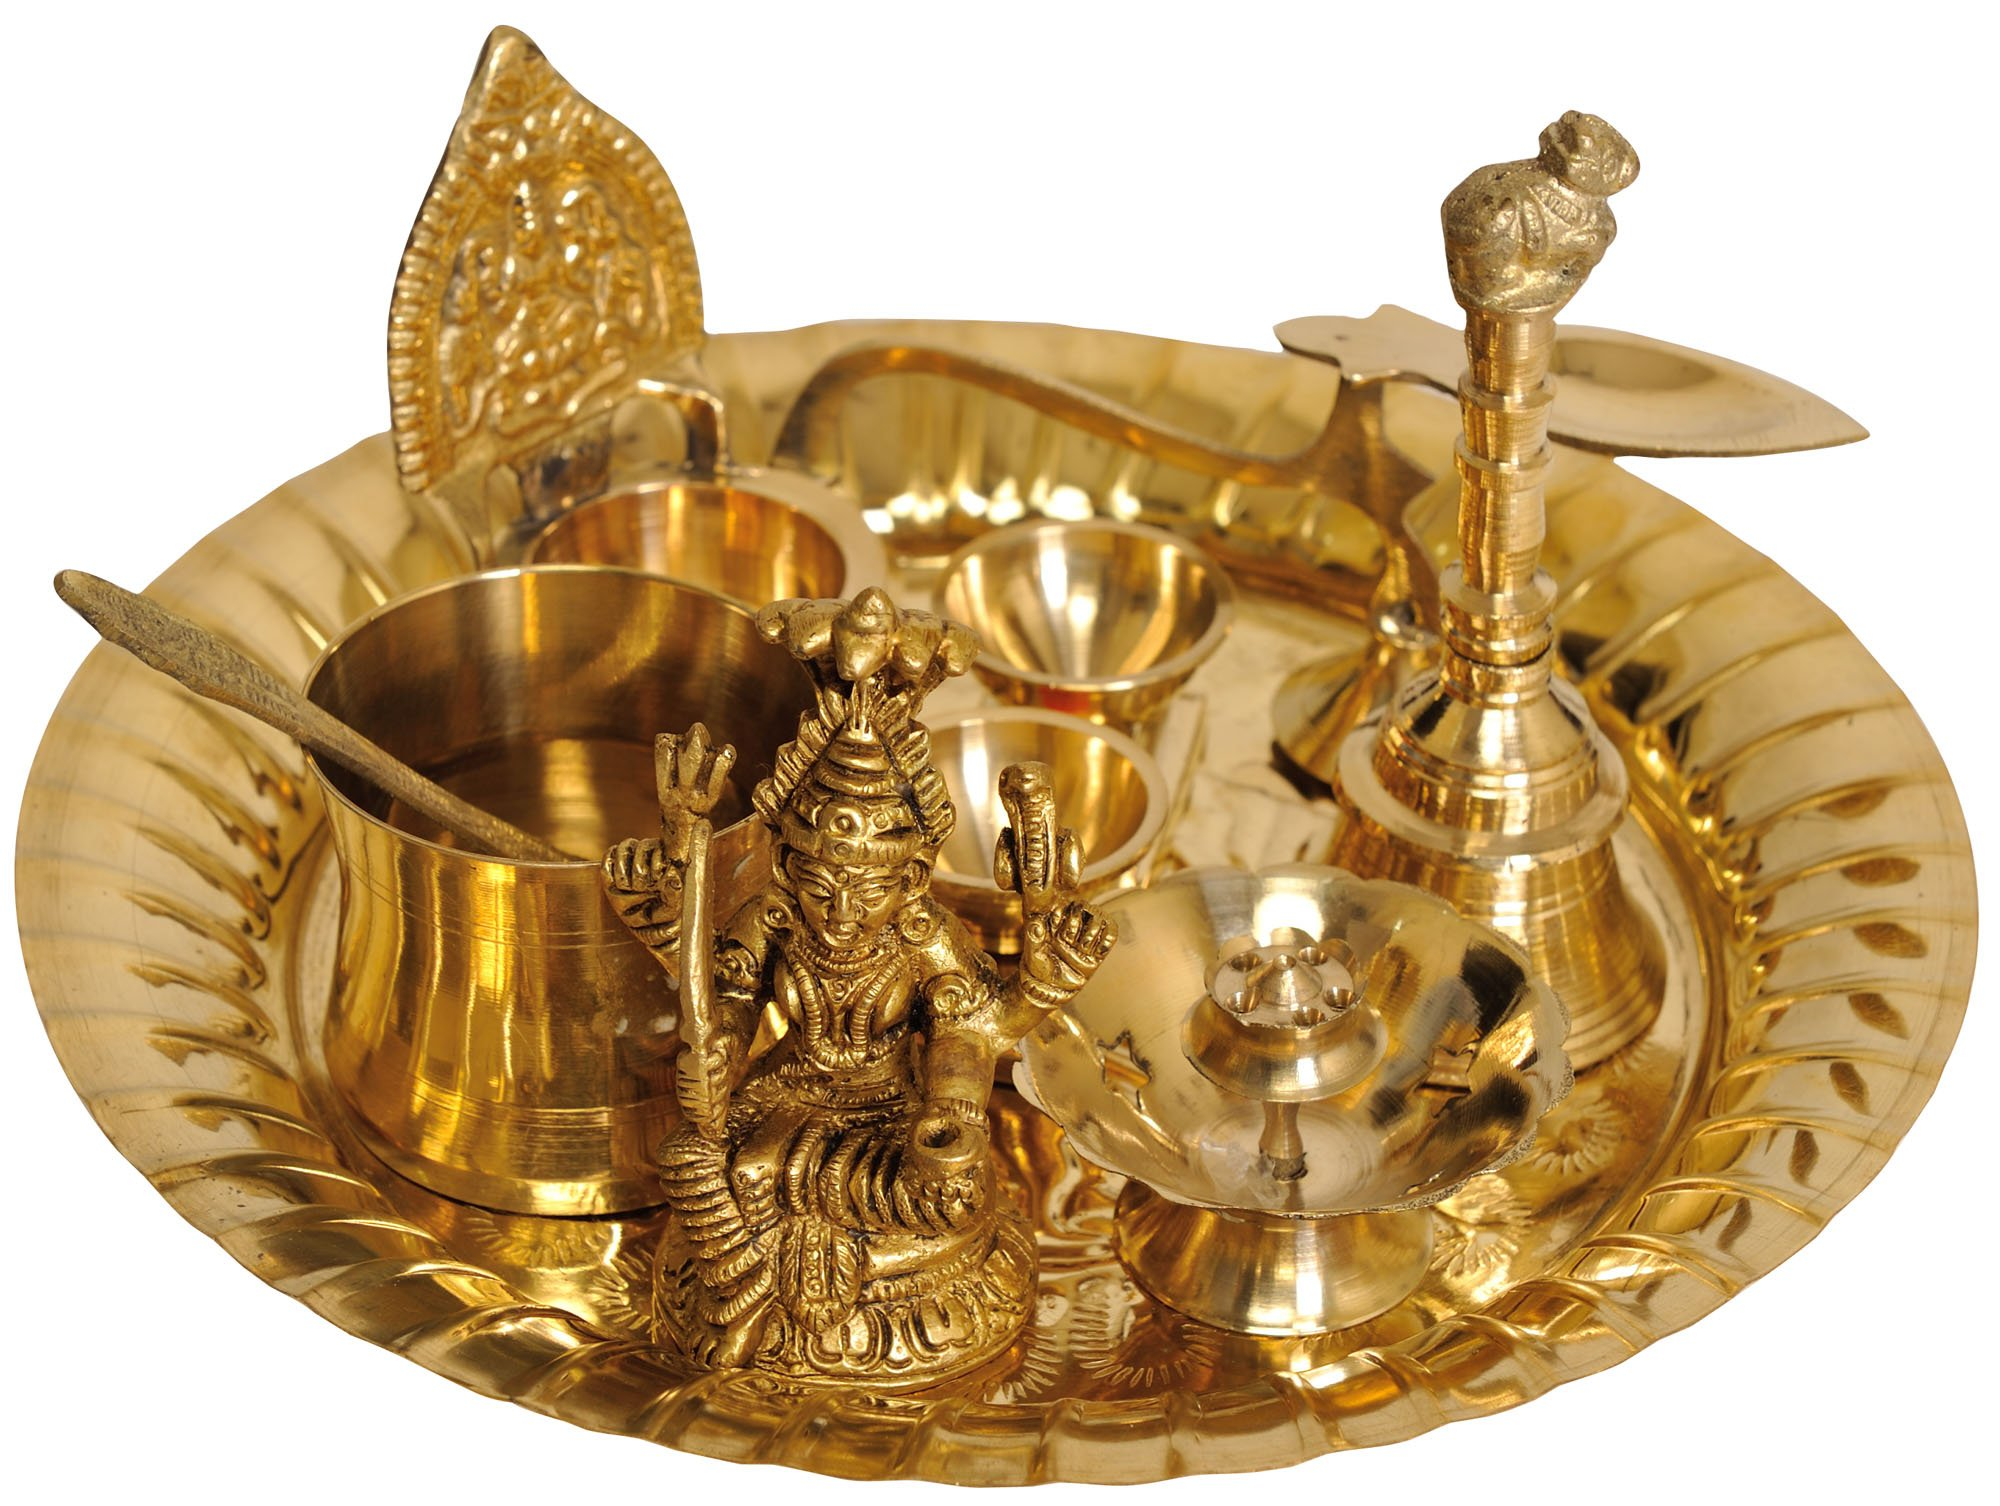 Exotic India ZCA72 Lord Shiva Puja Thali with Lakshmi Ji Diya